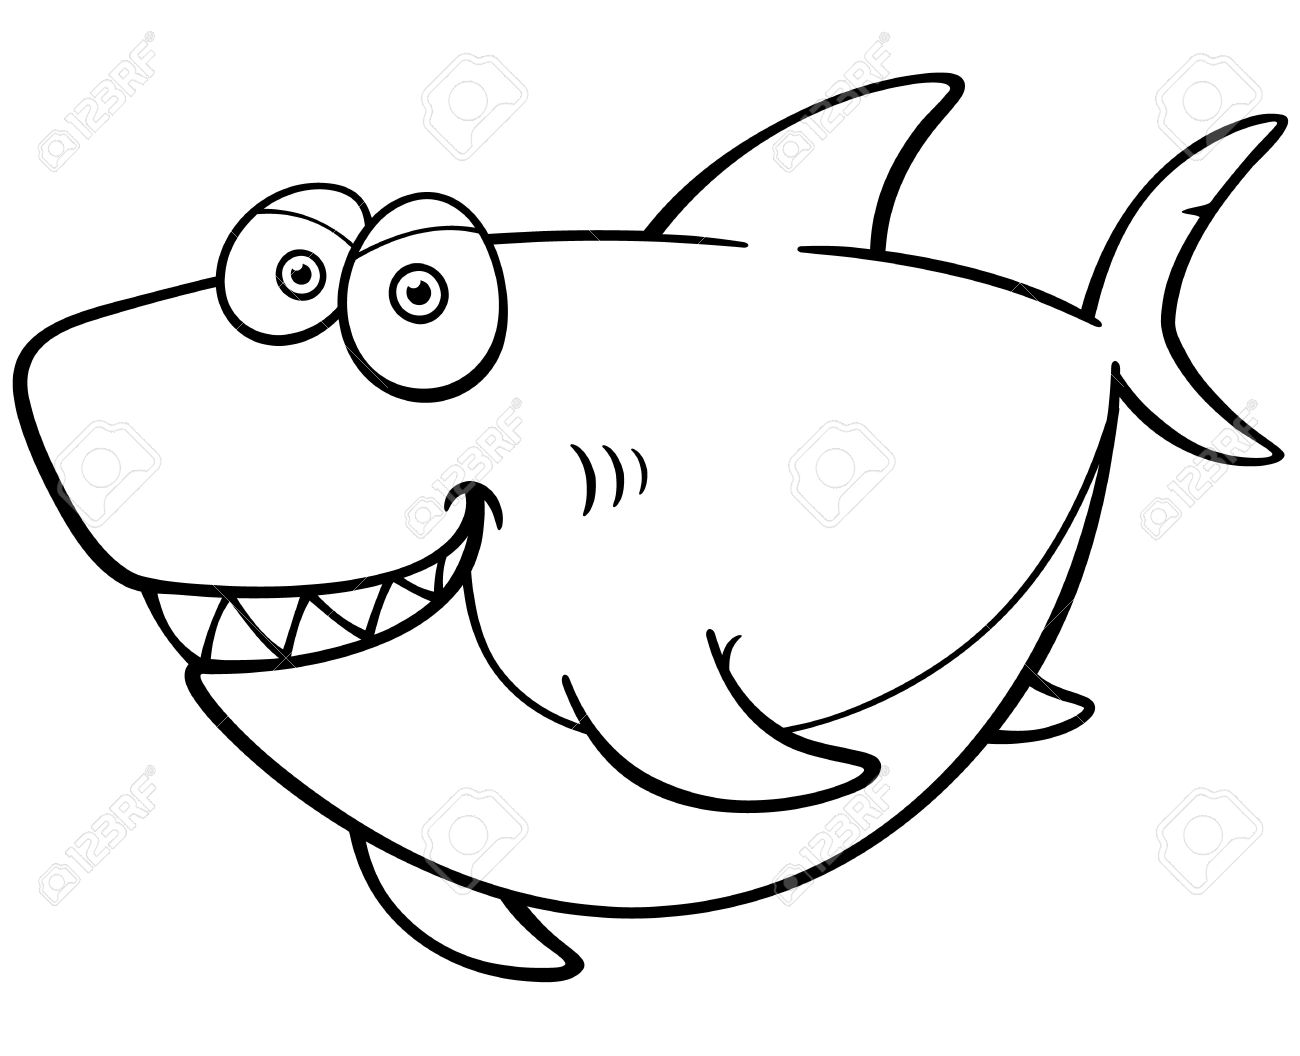 Ilustración Vectorial De Dibujos Animados Shark - Libro Para ...